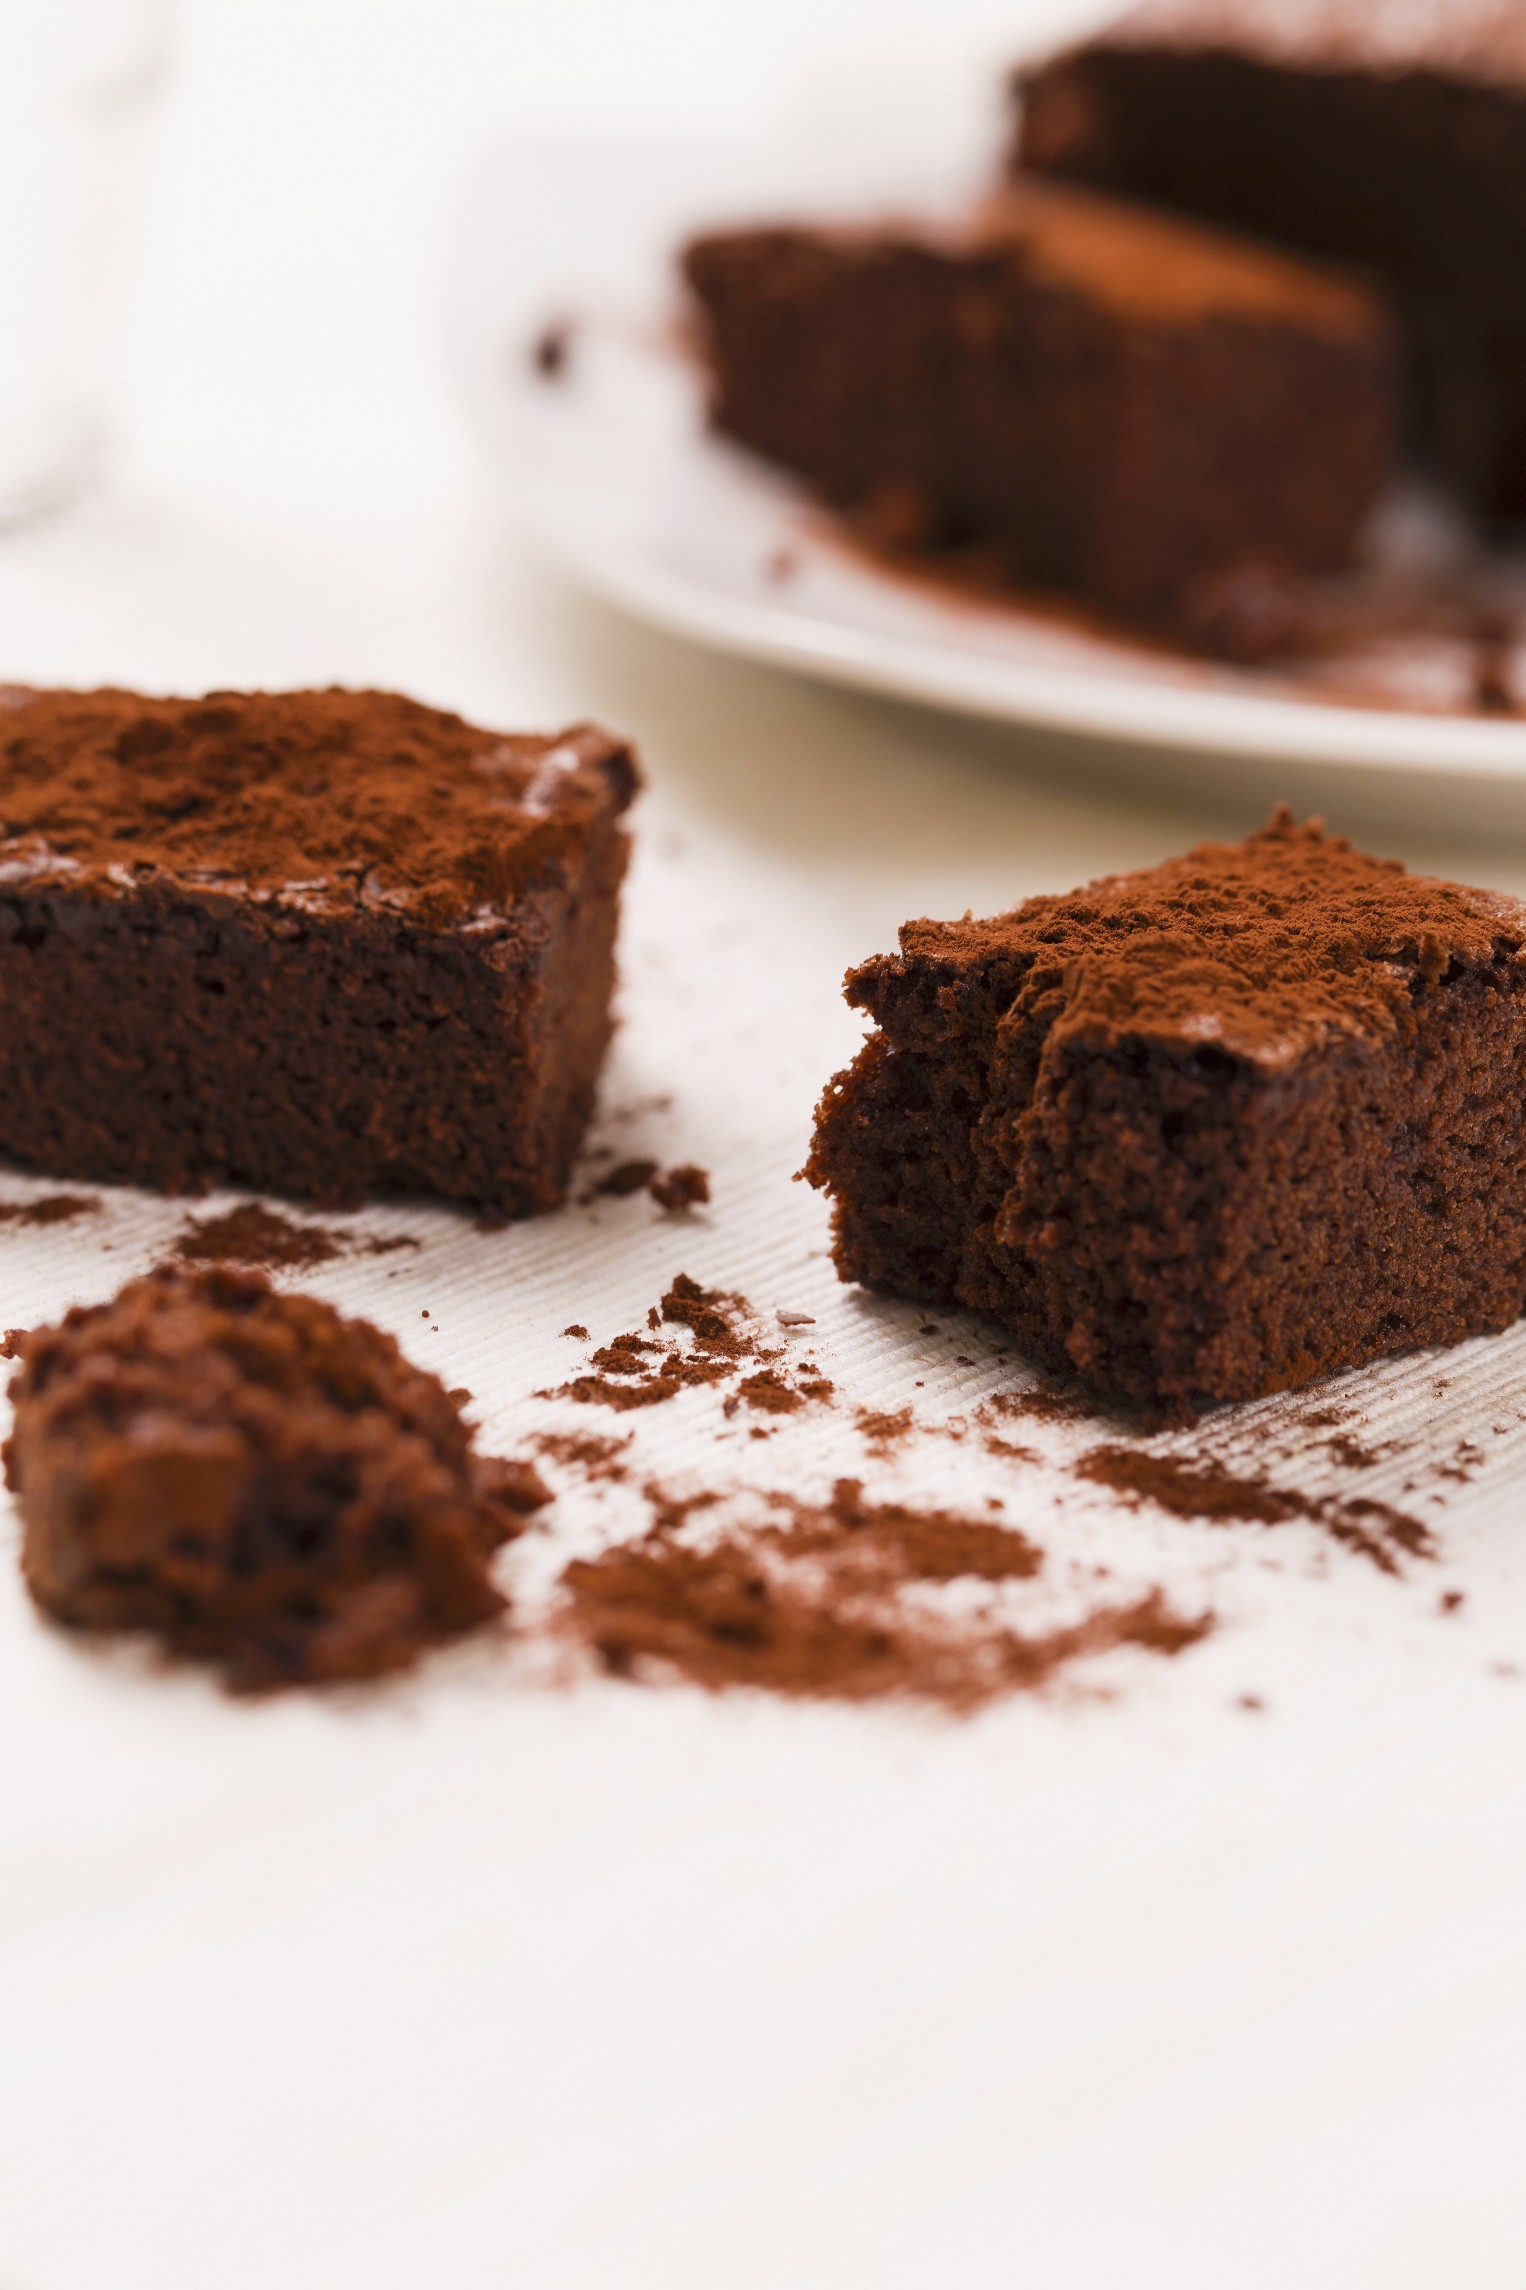 Ricetta Brownies Bimby Senza Burro.Ricetta Brownies Senza Uova Agrodolce